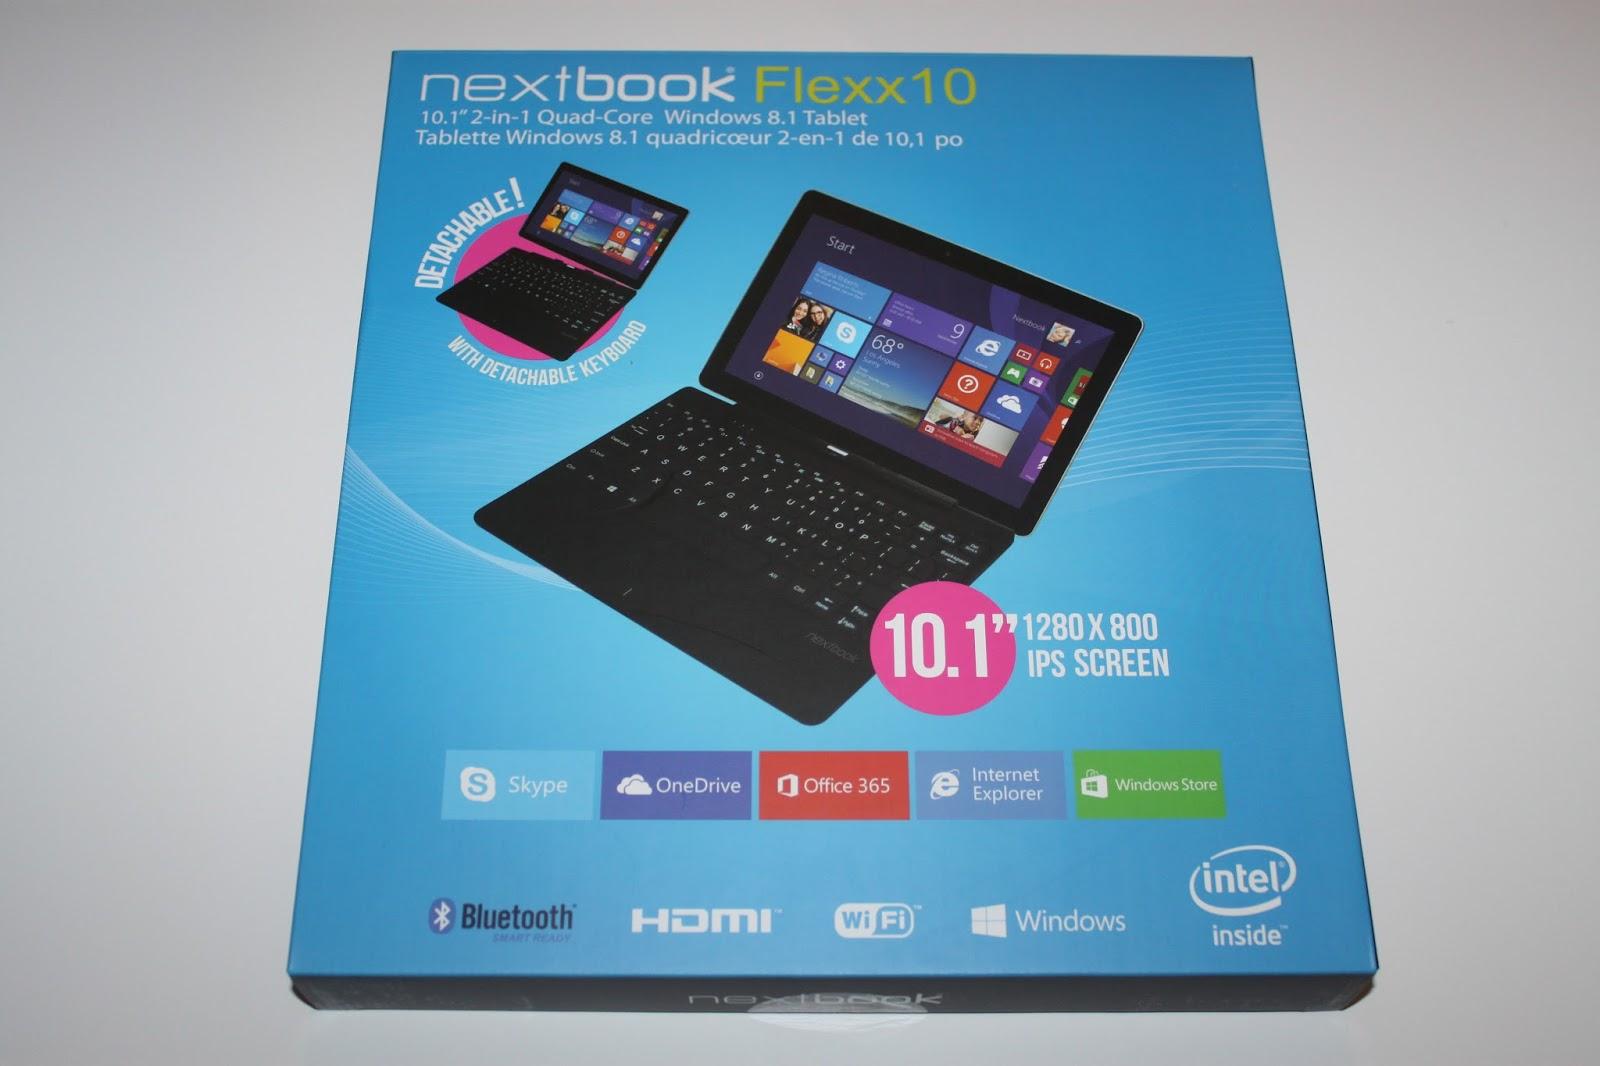 Windows nextbook flex 10 -  Nextbook Flexx 10 Features And Specs 10 1 Inch High Resolution 1280 X 800 Ips Screen Intel Atom Quad Core 1 8ghz Z3735f